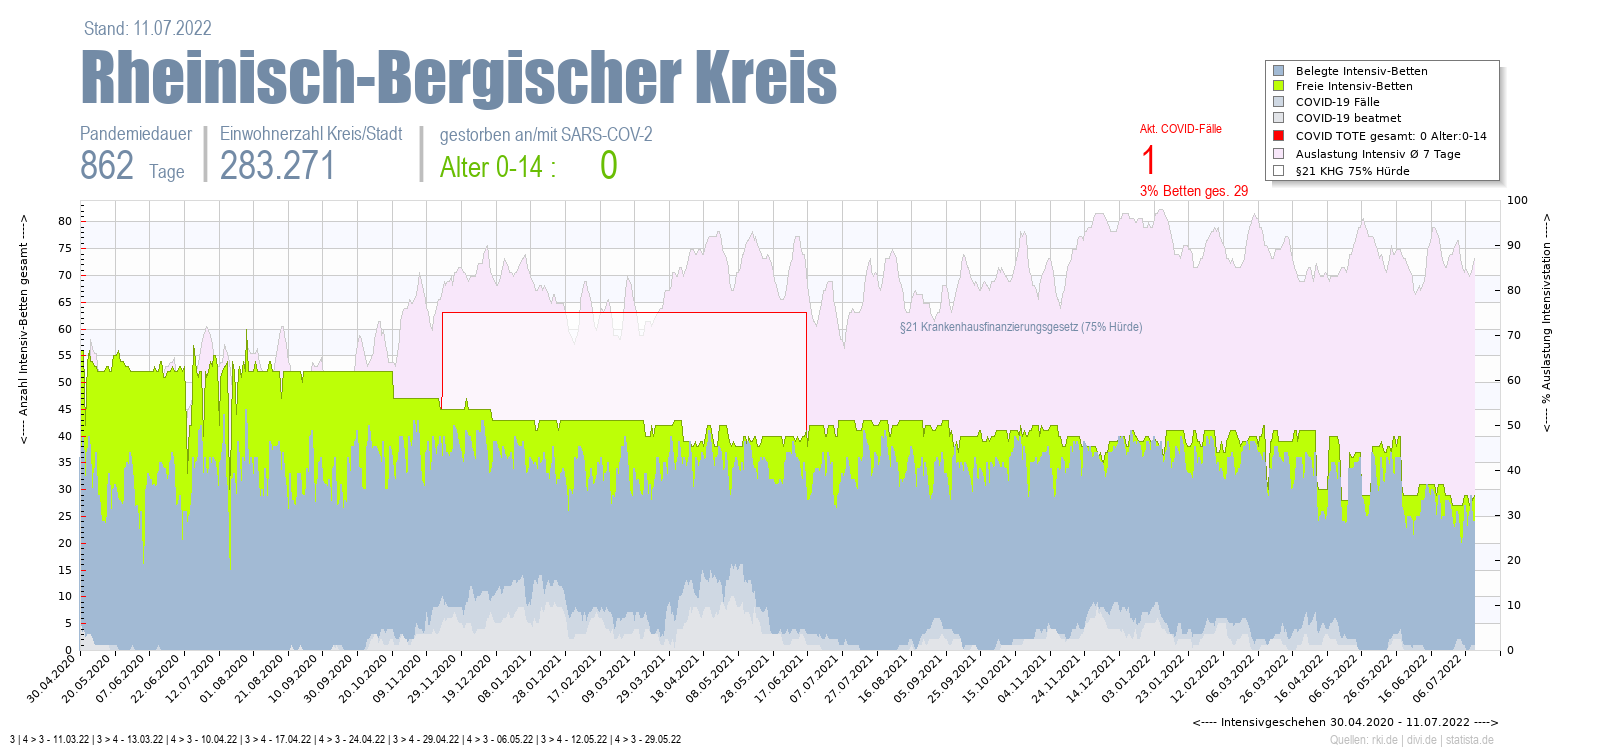 Intensivstation Auslastung Rheinisch-Bergischer Kreis Alter 0-4